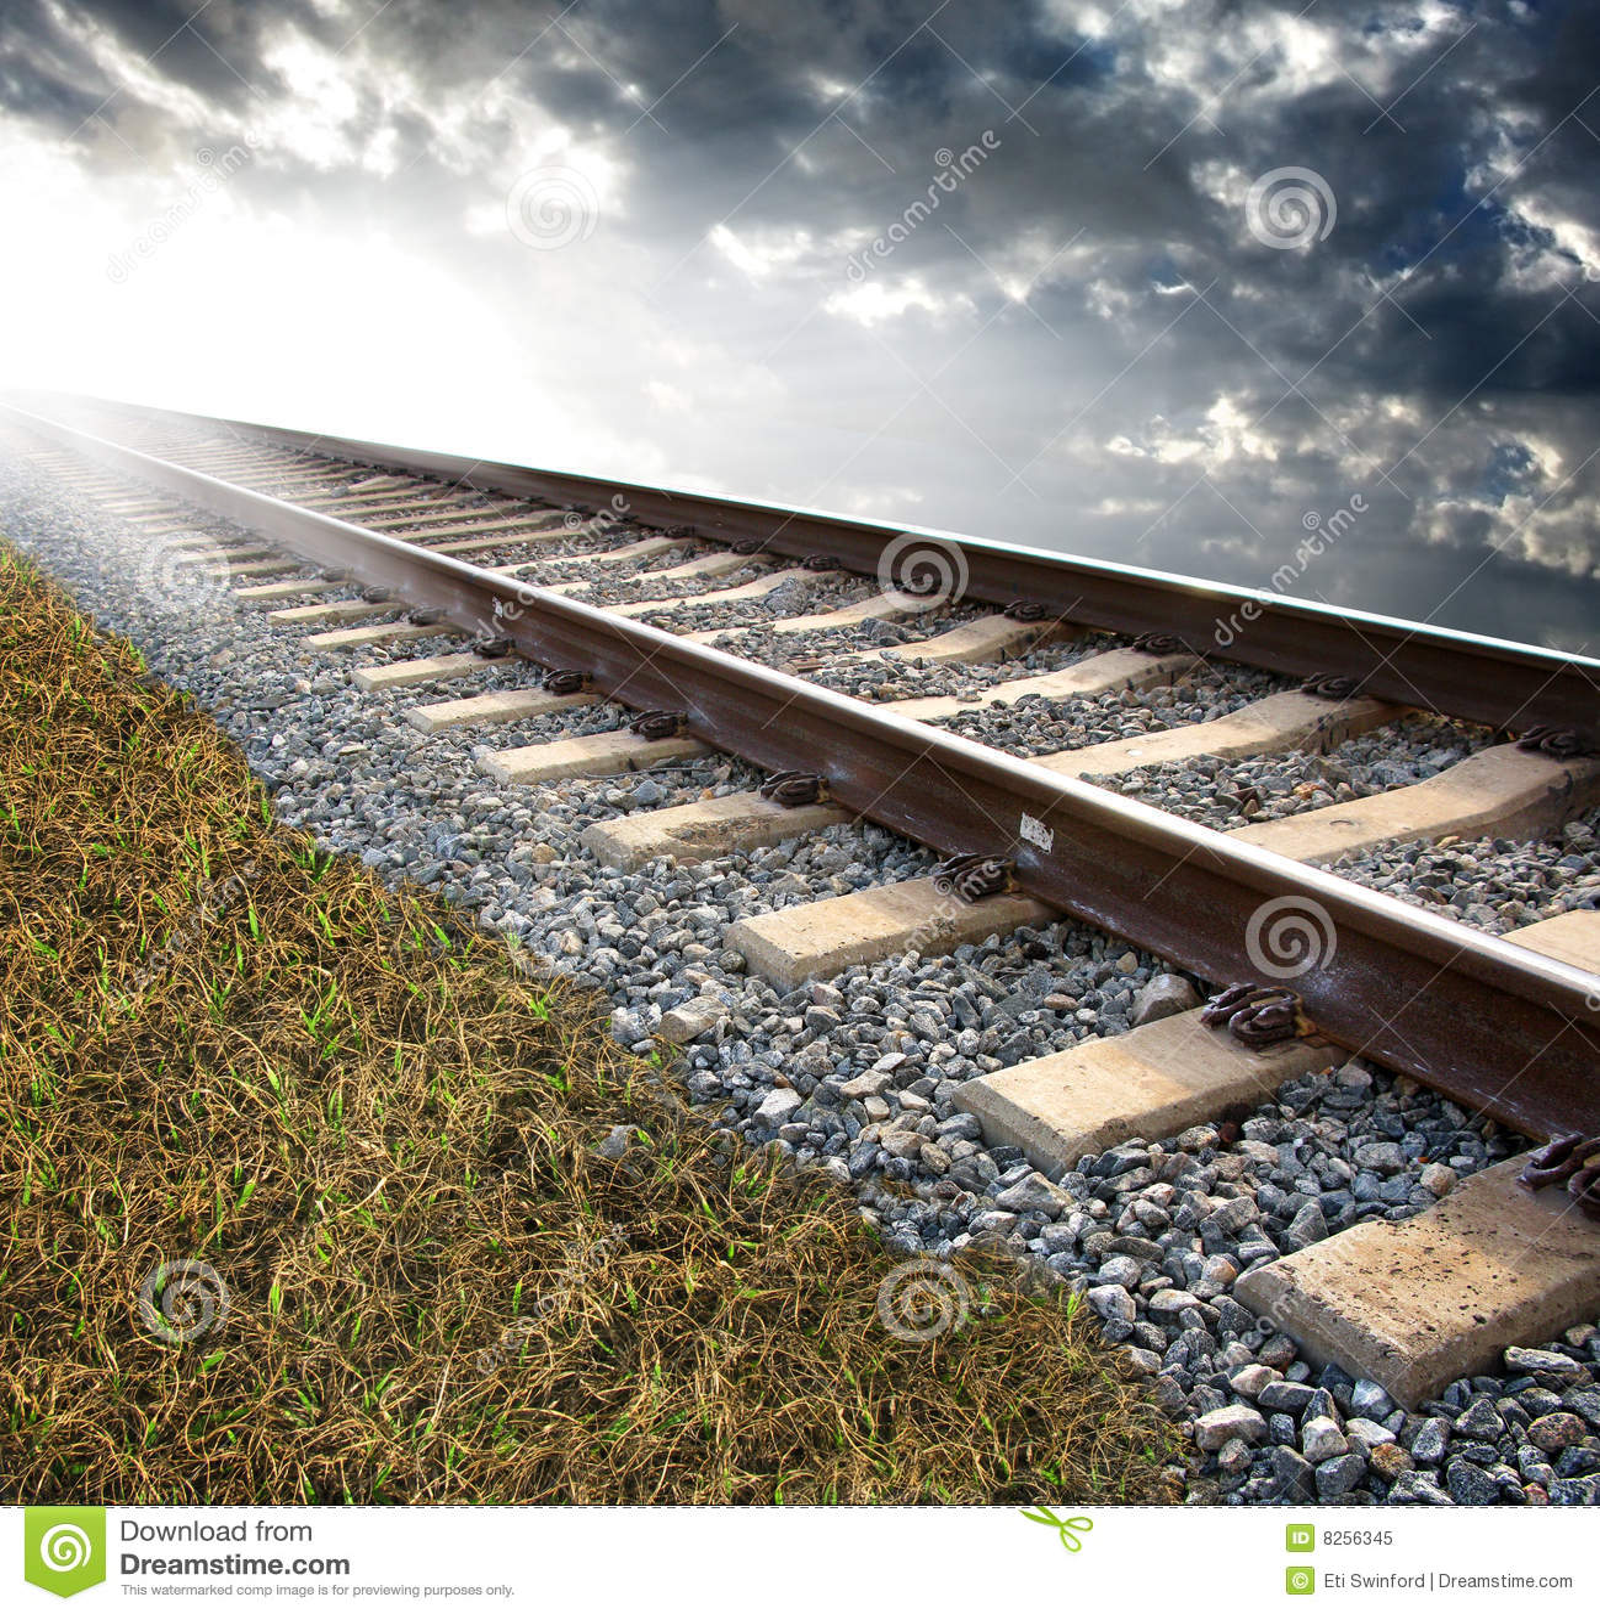 Binari ferroviari